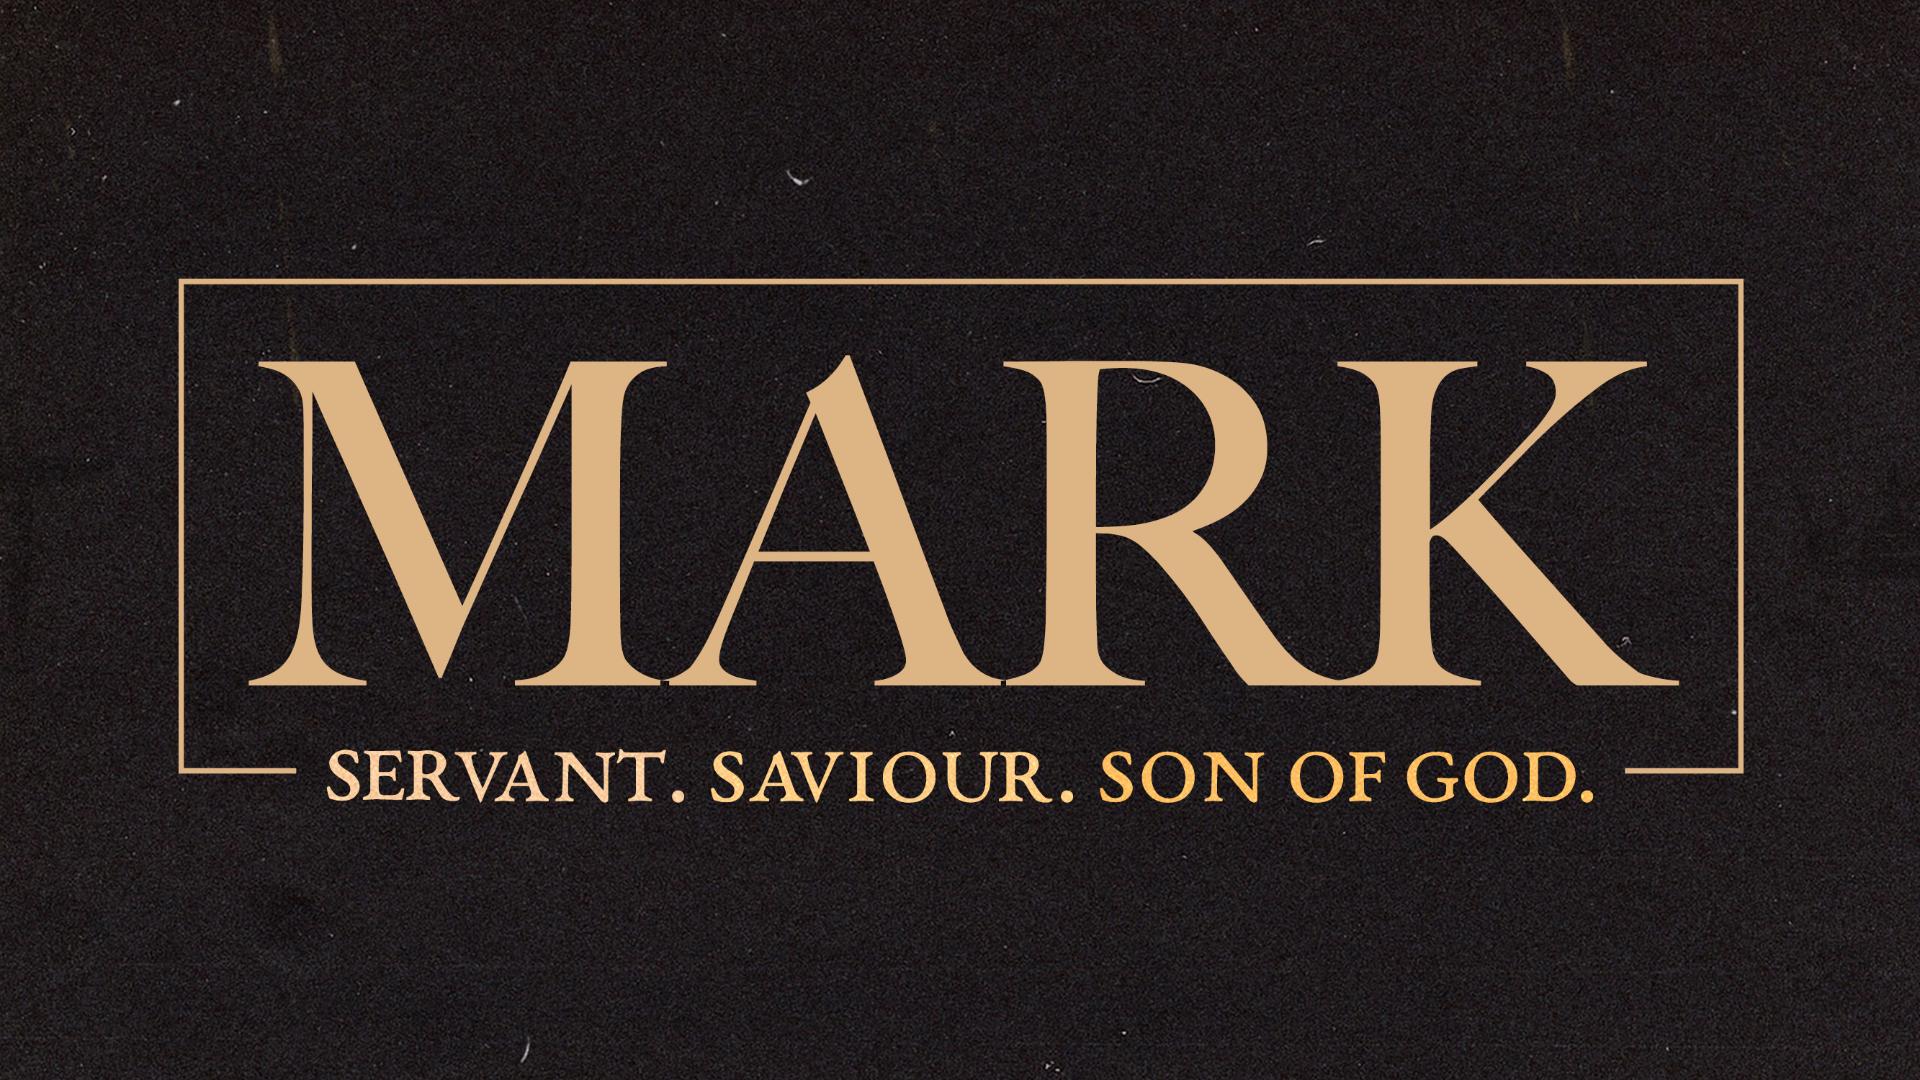 Jesus: Servant Saviour Son of God  Art Work